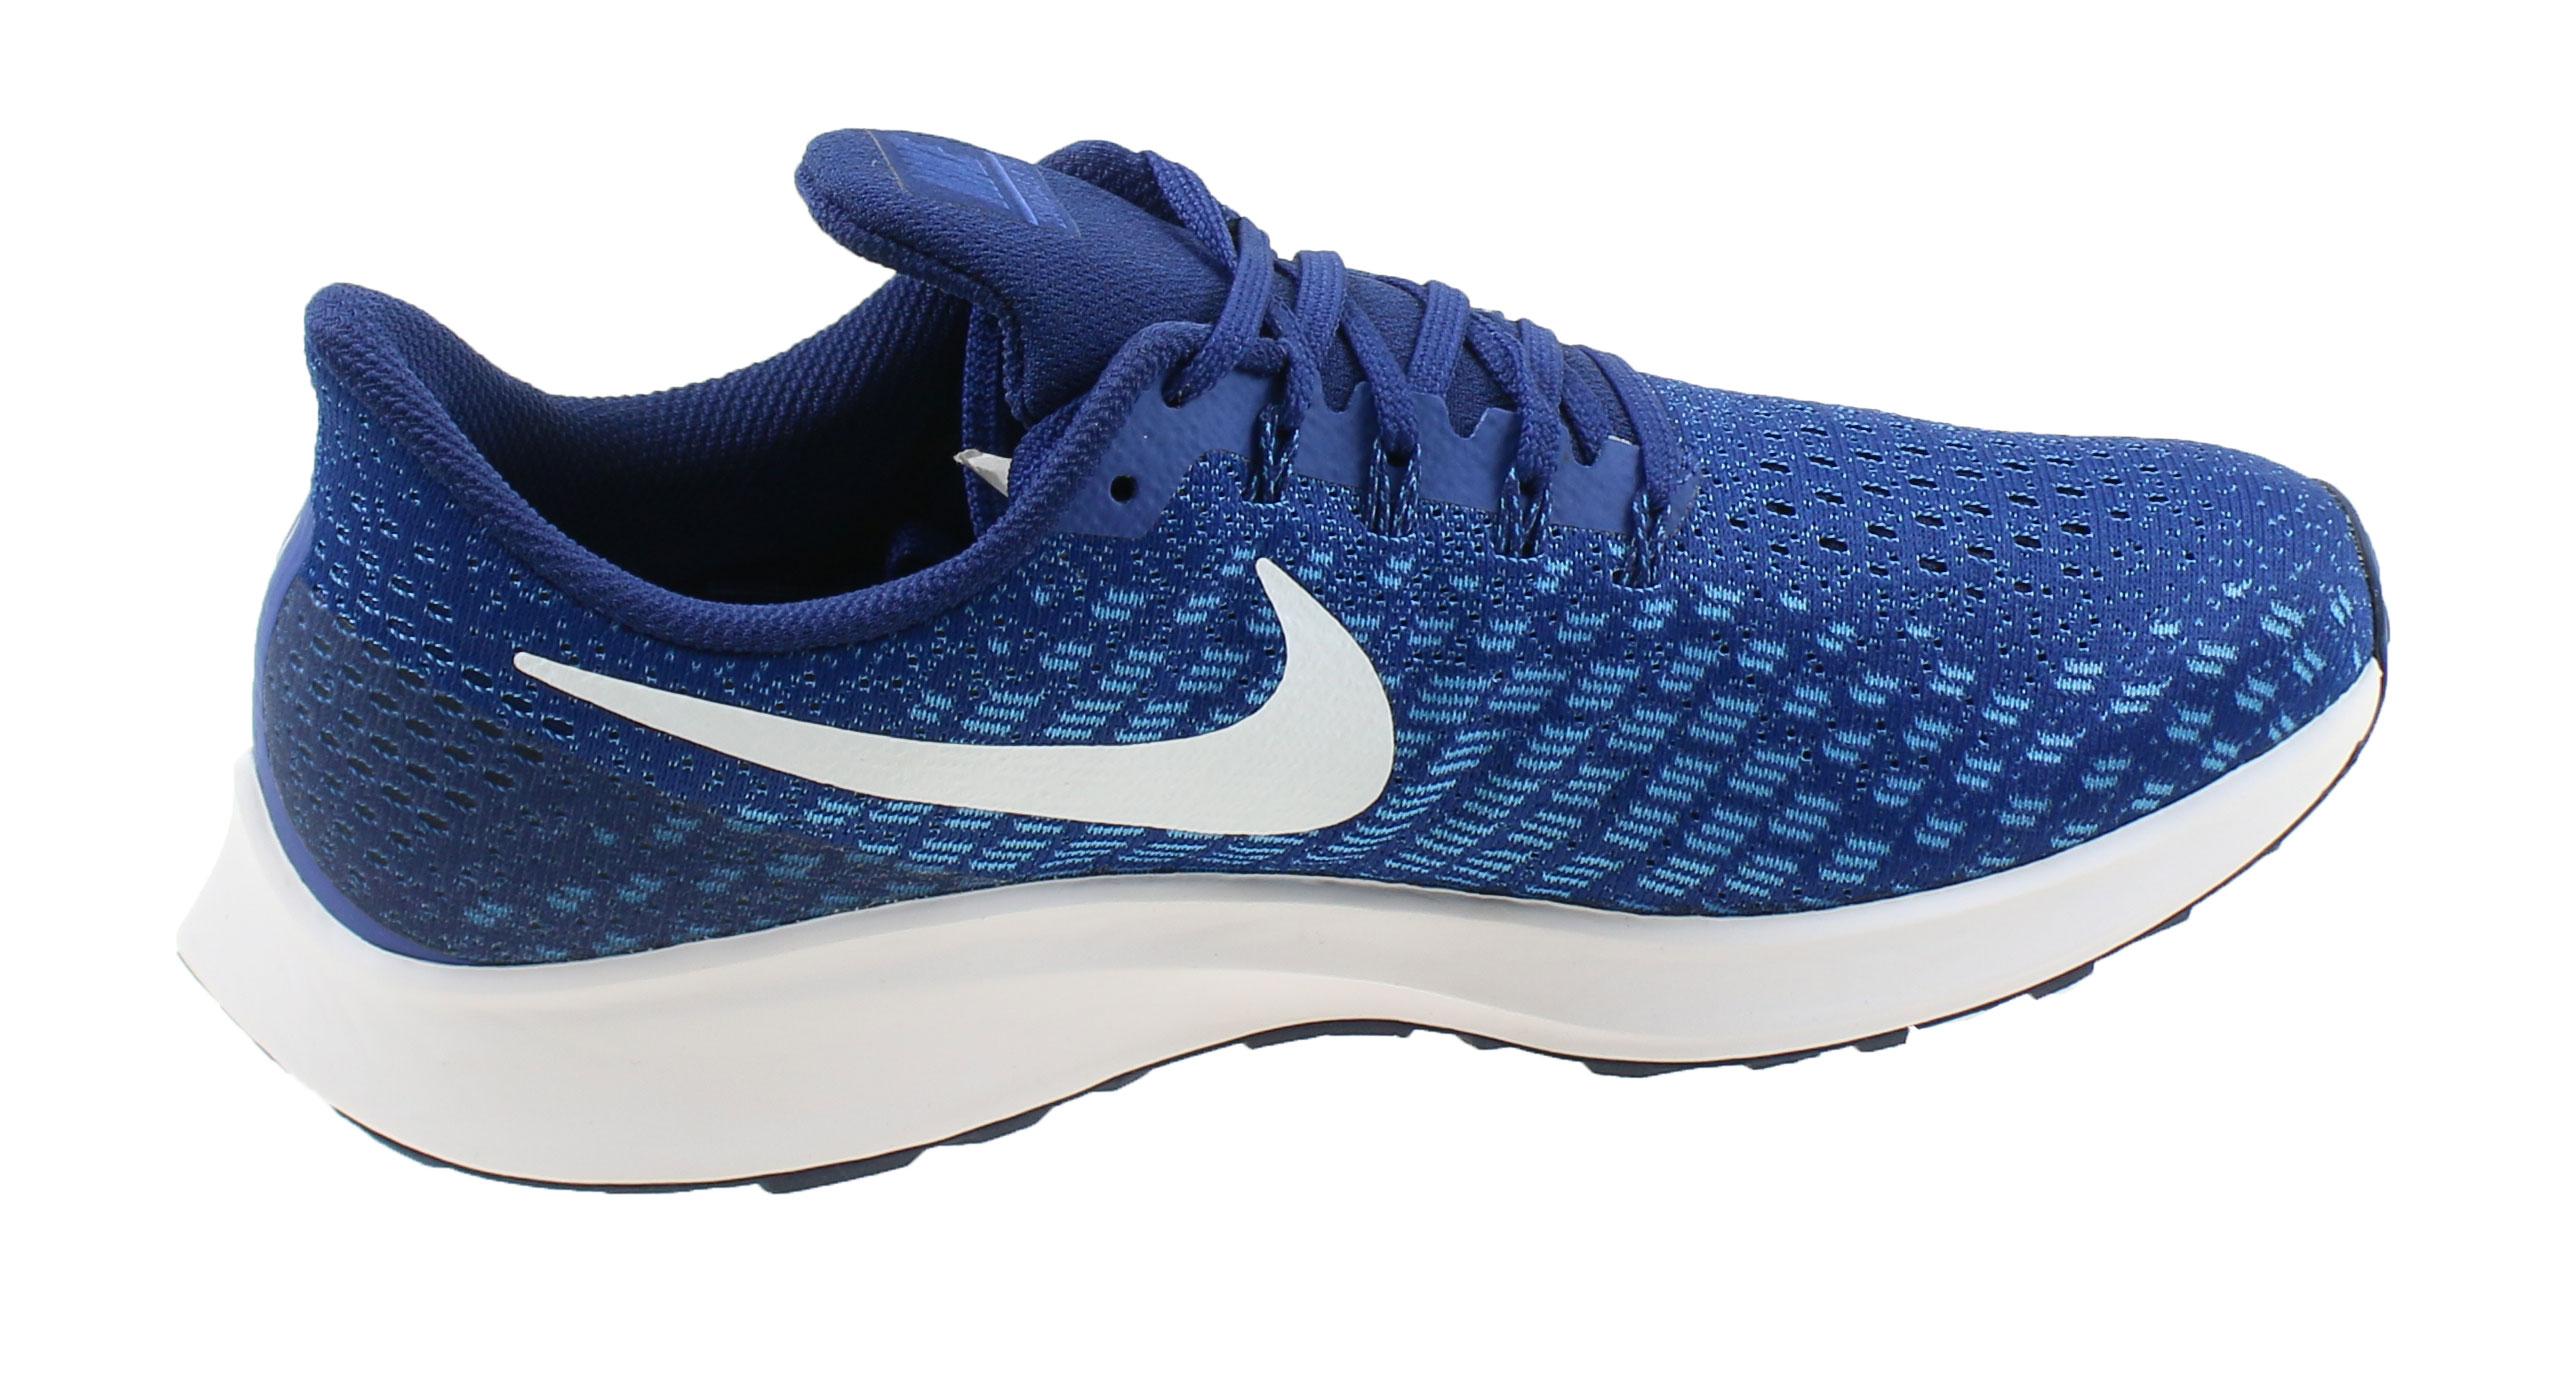 8e5fc778cc9 Nike Air Zoom Pegasus 35 Heren Hardloopschoen. 942851 404 Indigo Force  White Photo Blue. Product afbeelding Product afbeelding ...